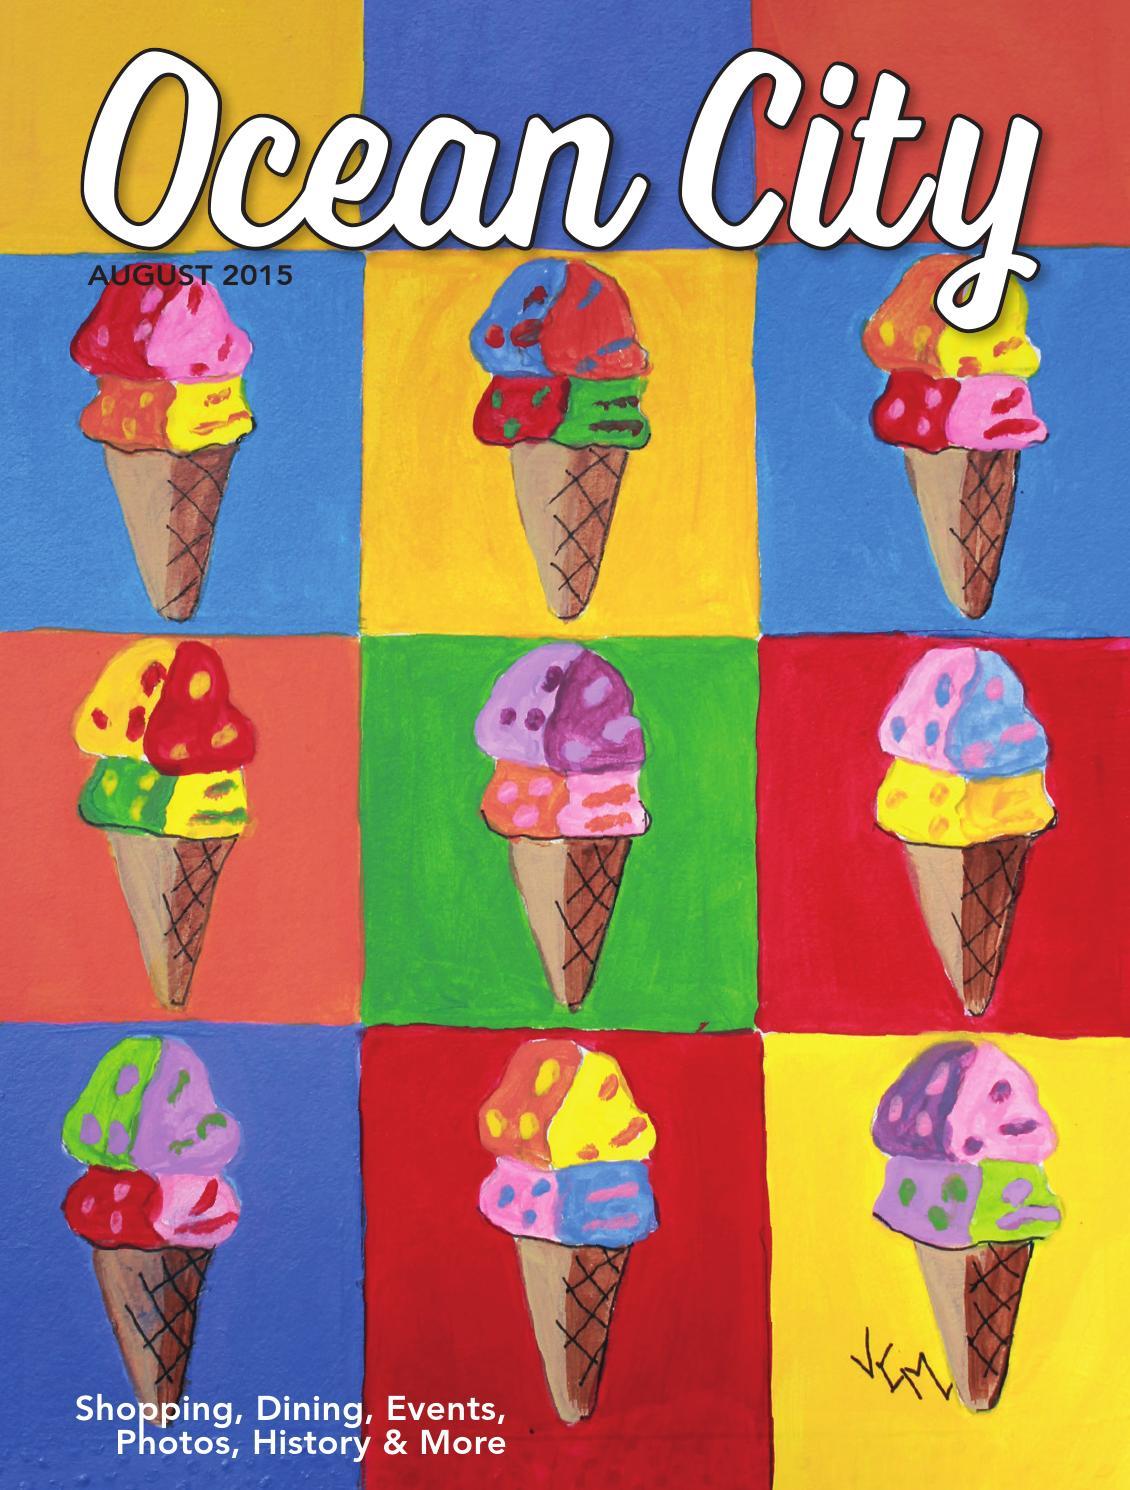 51fbaaee9dcc4 August 2015 Ocean City Magazine by Ocean City Magazine - issuu